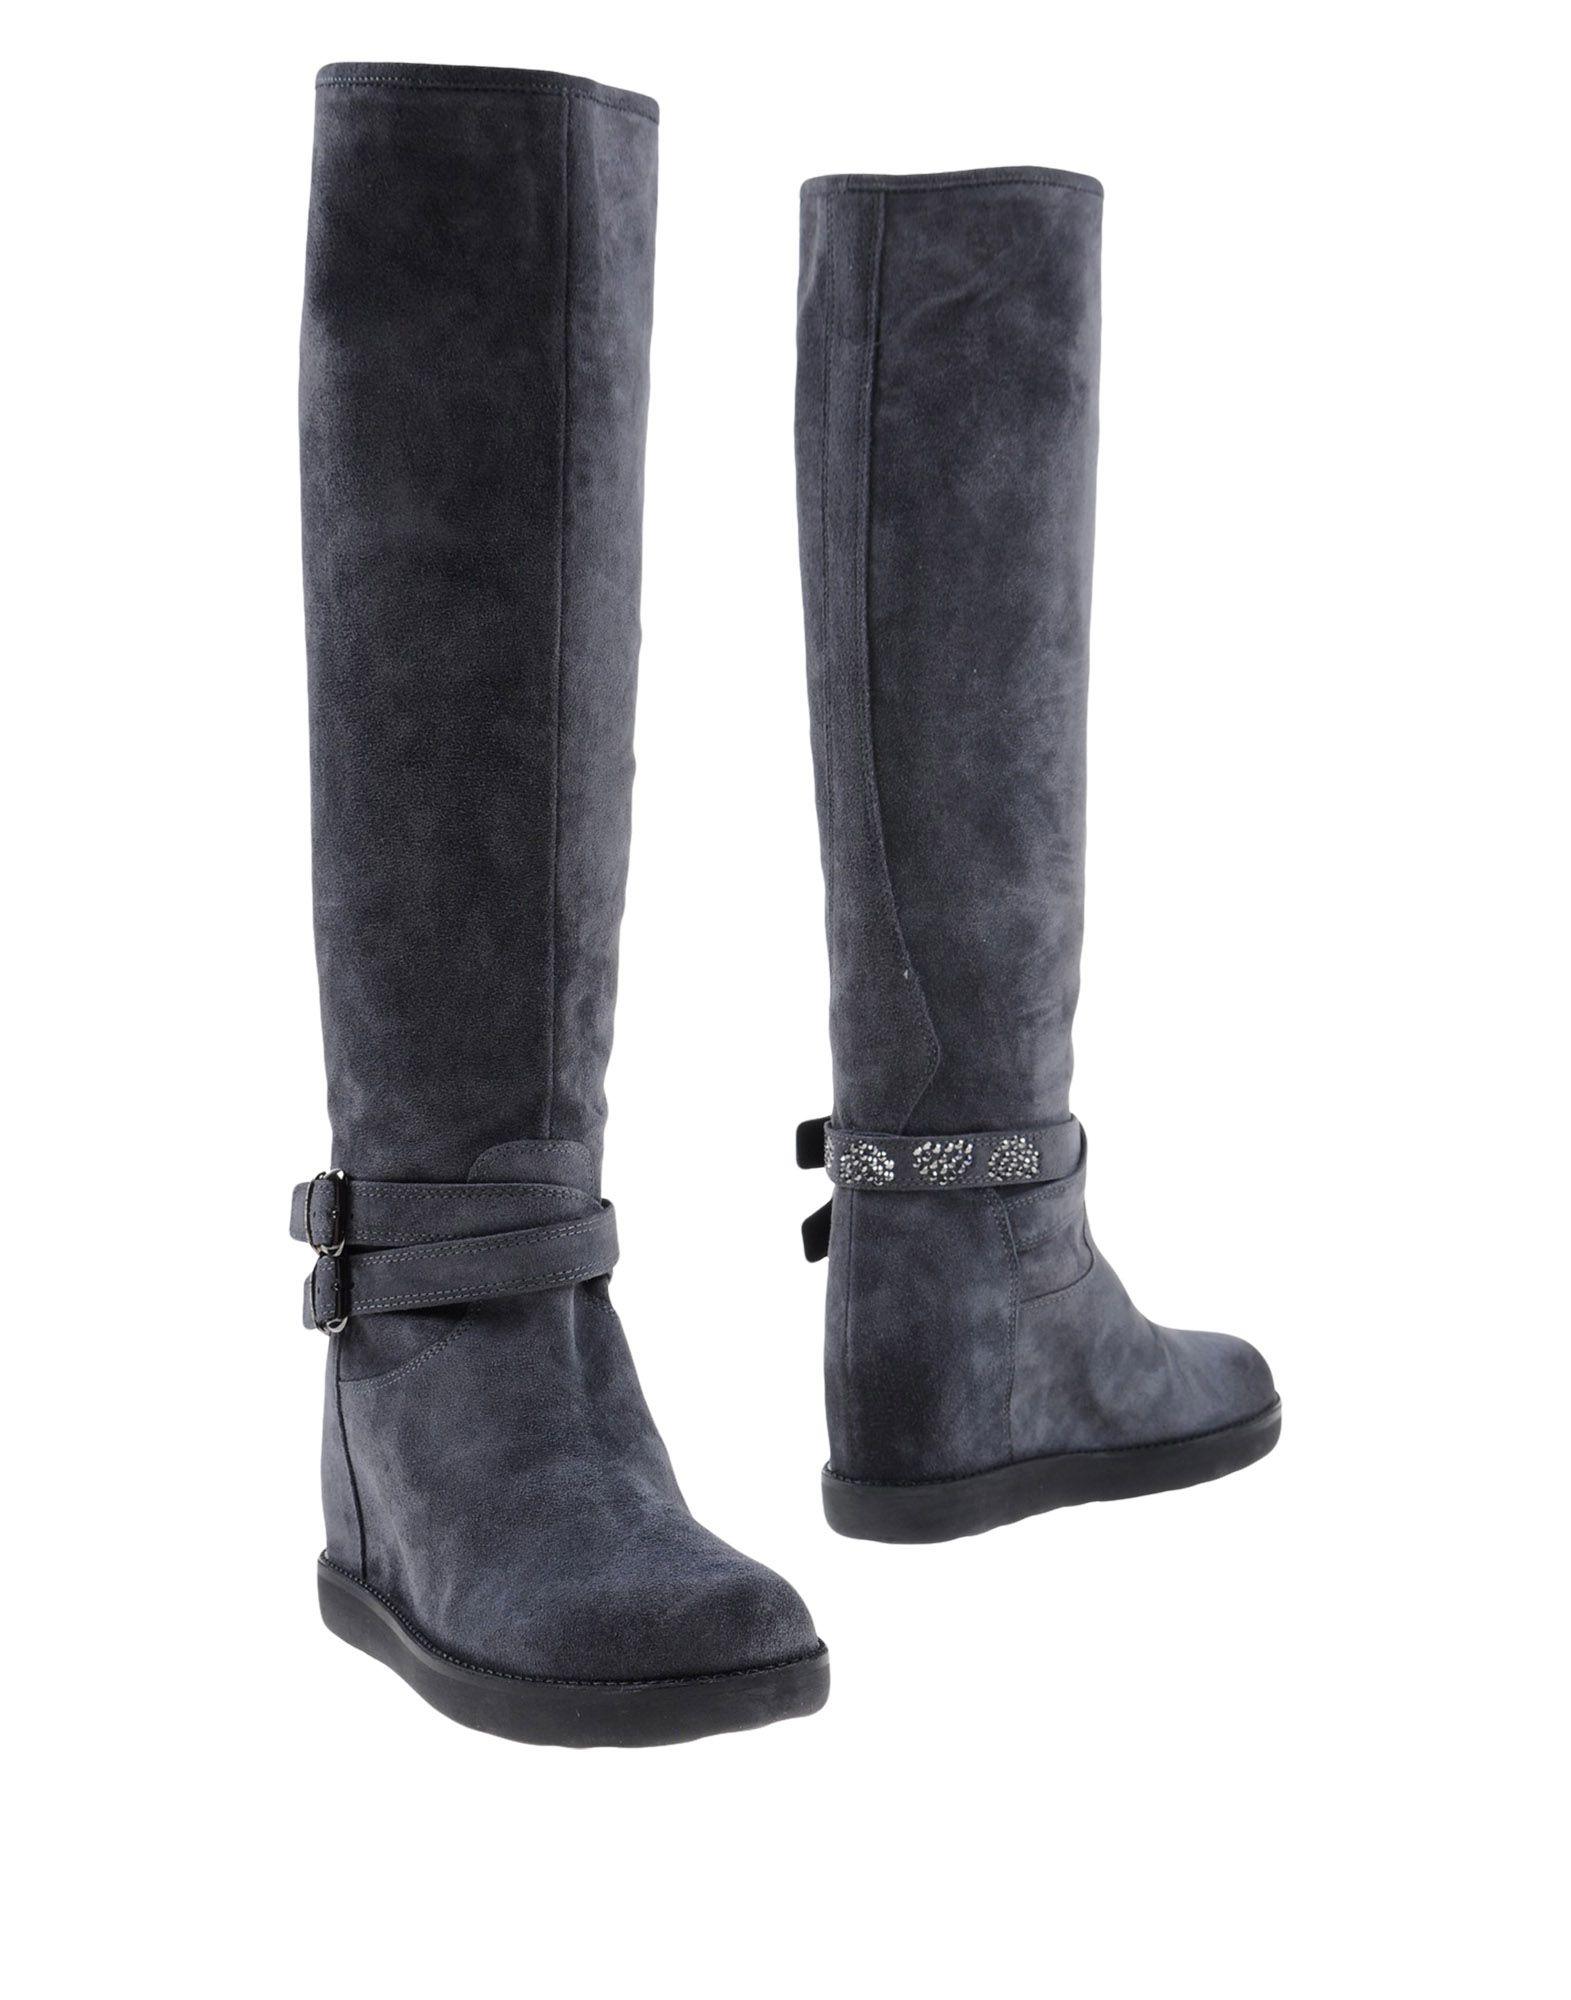 Haltbare Mode Beliebte billige Schuhe Twin 11005137KS Beliebte Mode Schuhe 9cd738